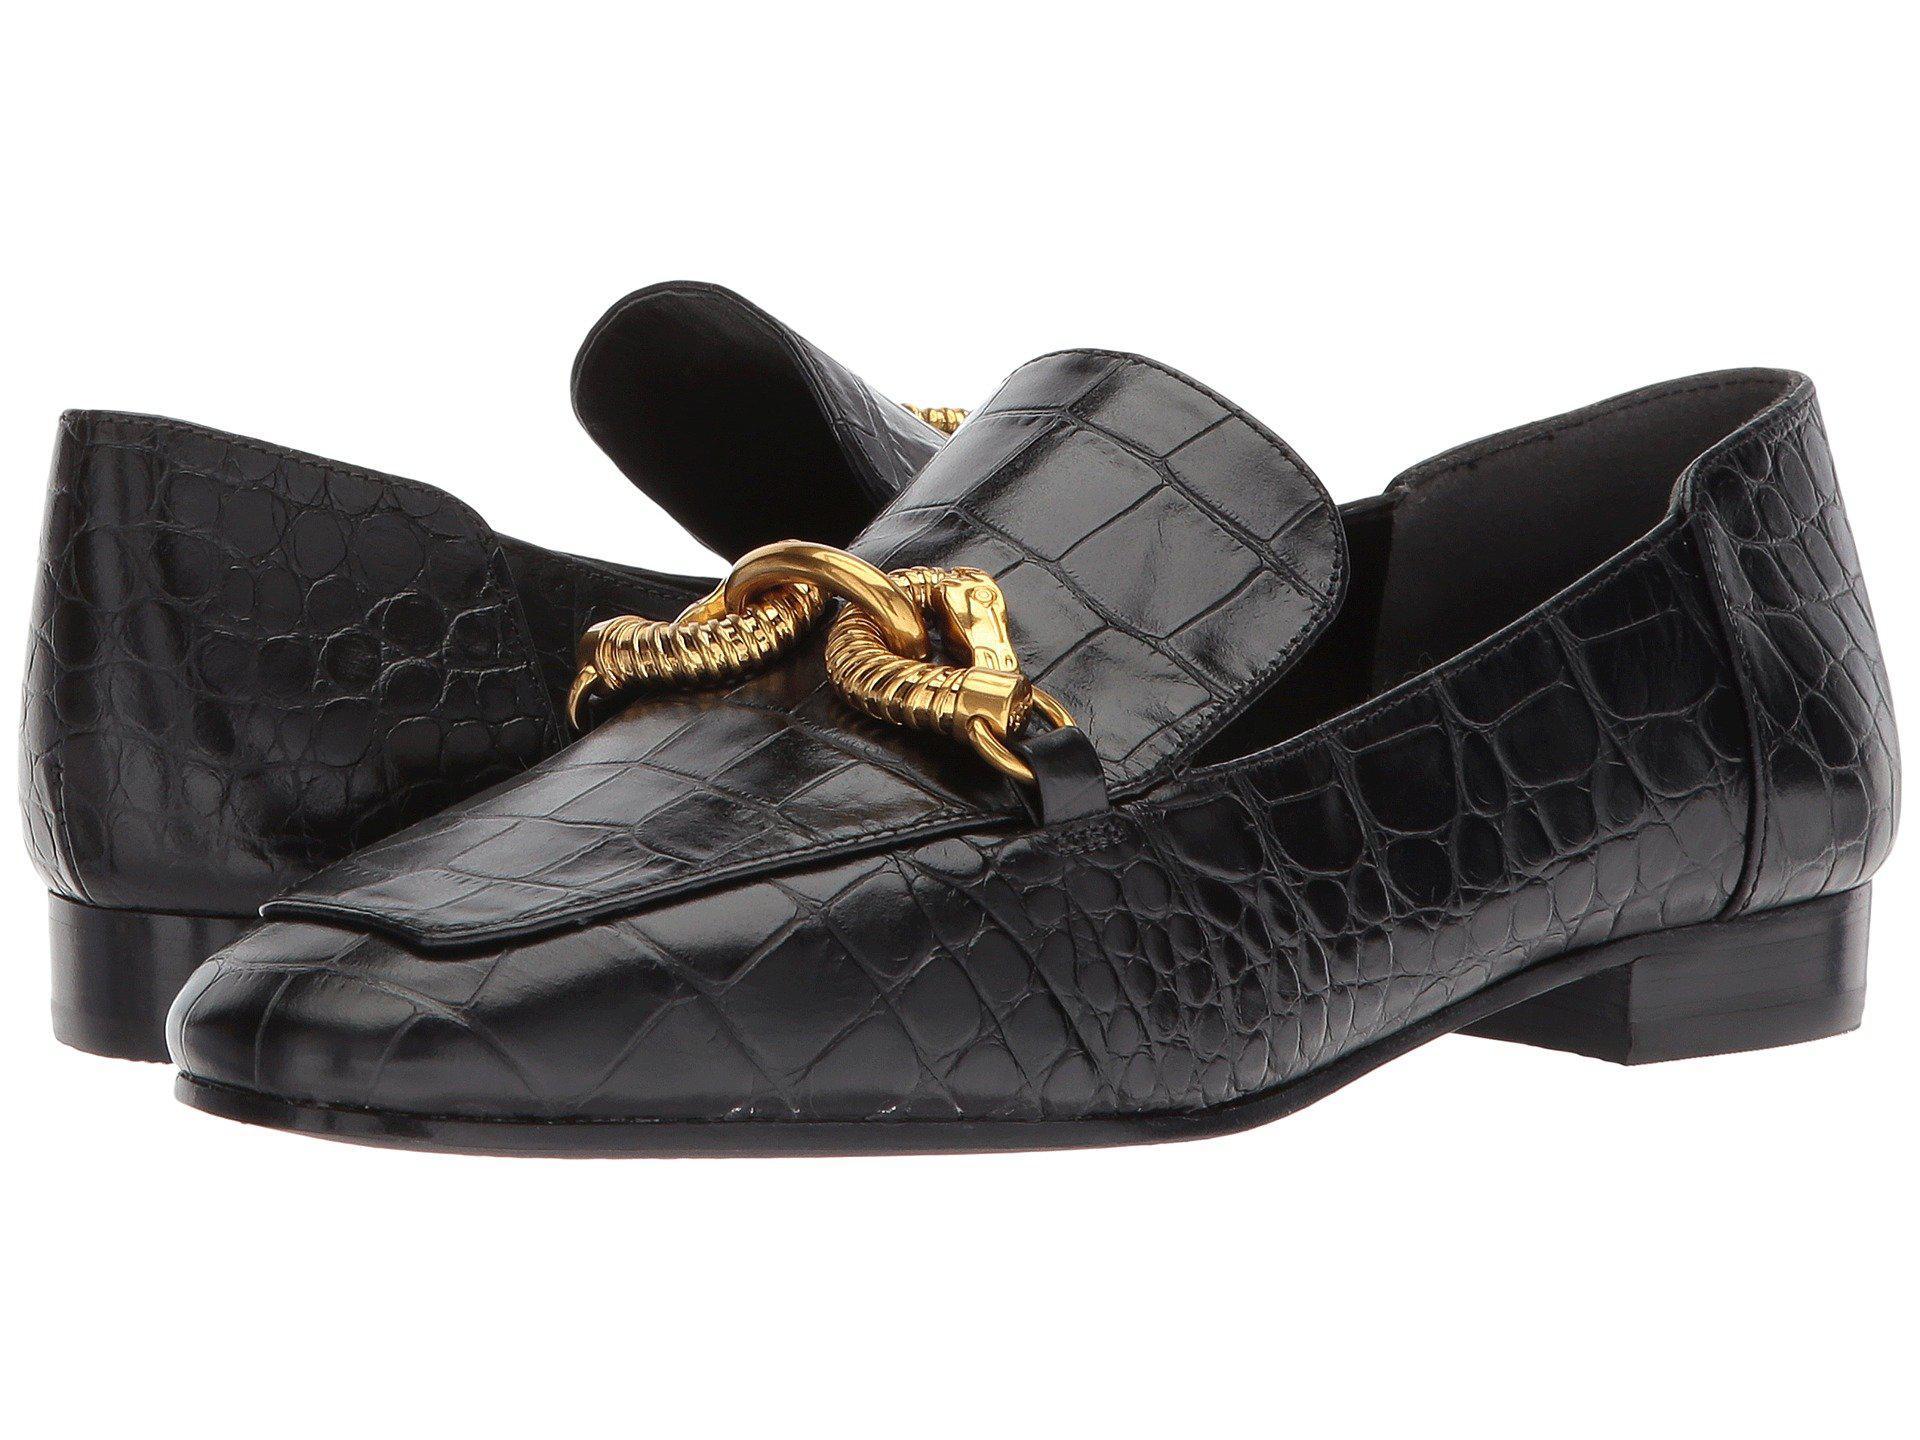 8dabe599e84 Lyst - Tory Burch Jessa Horse Head Loafer in Black